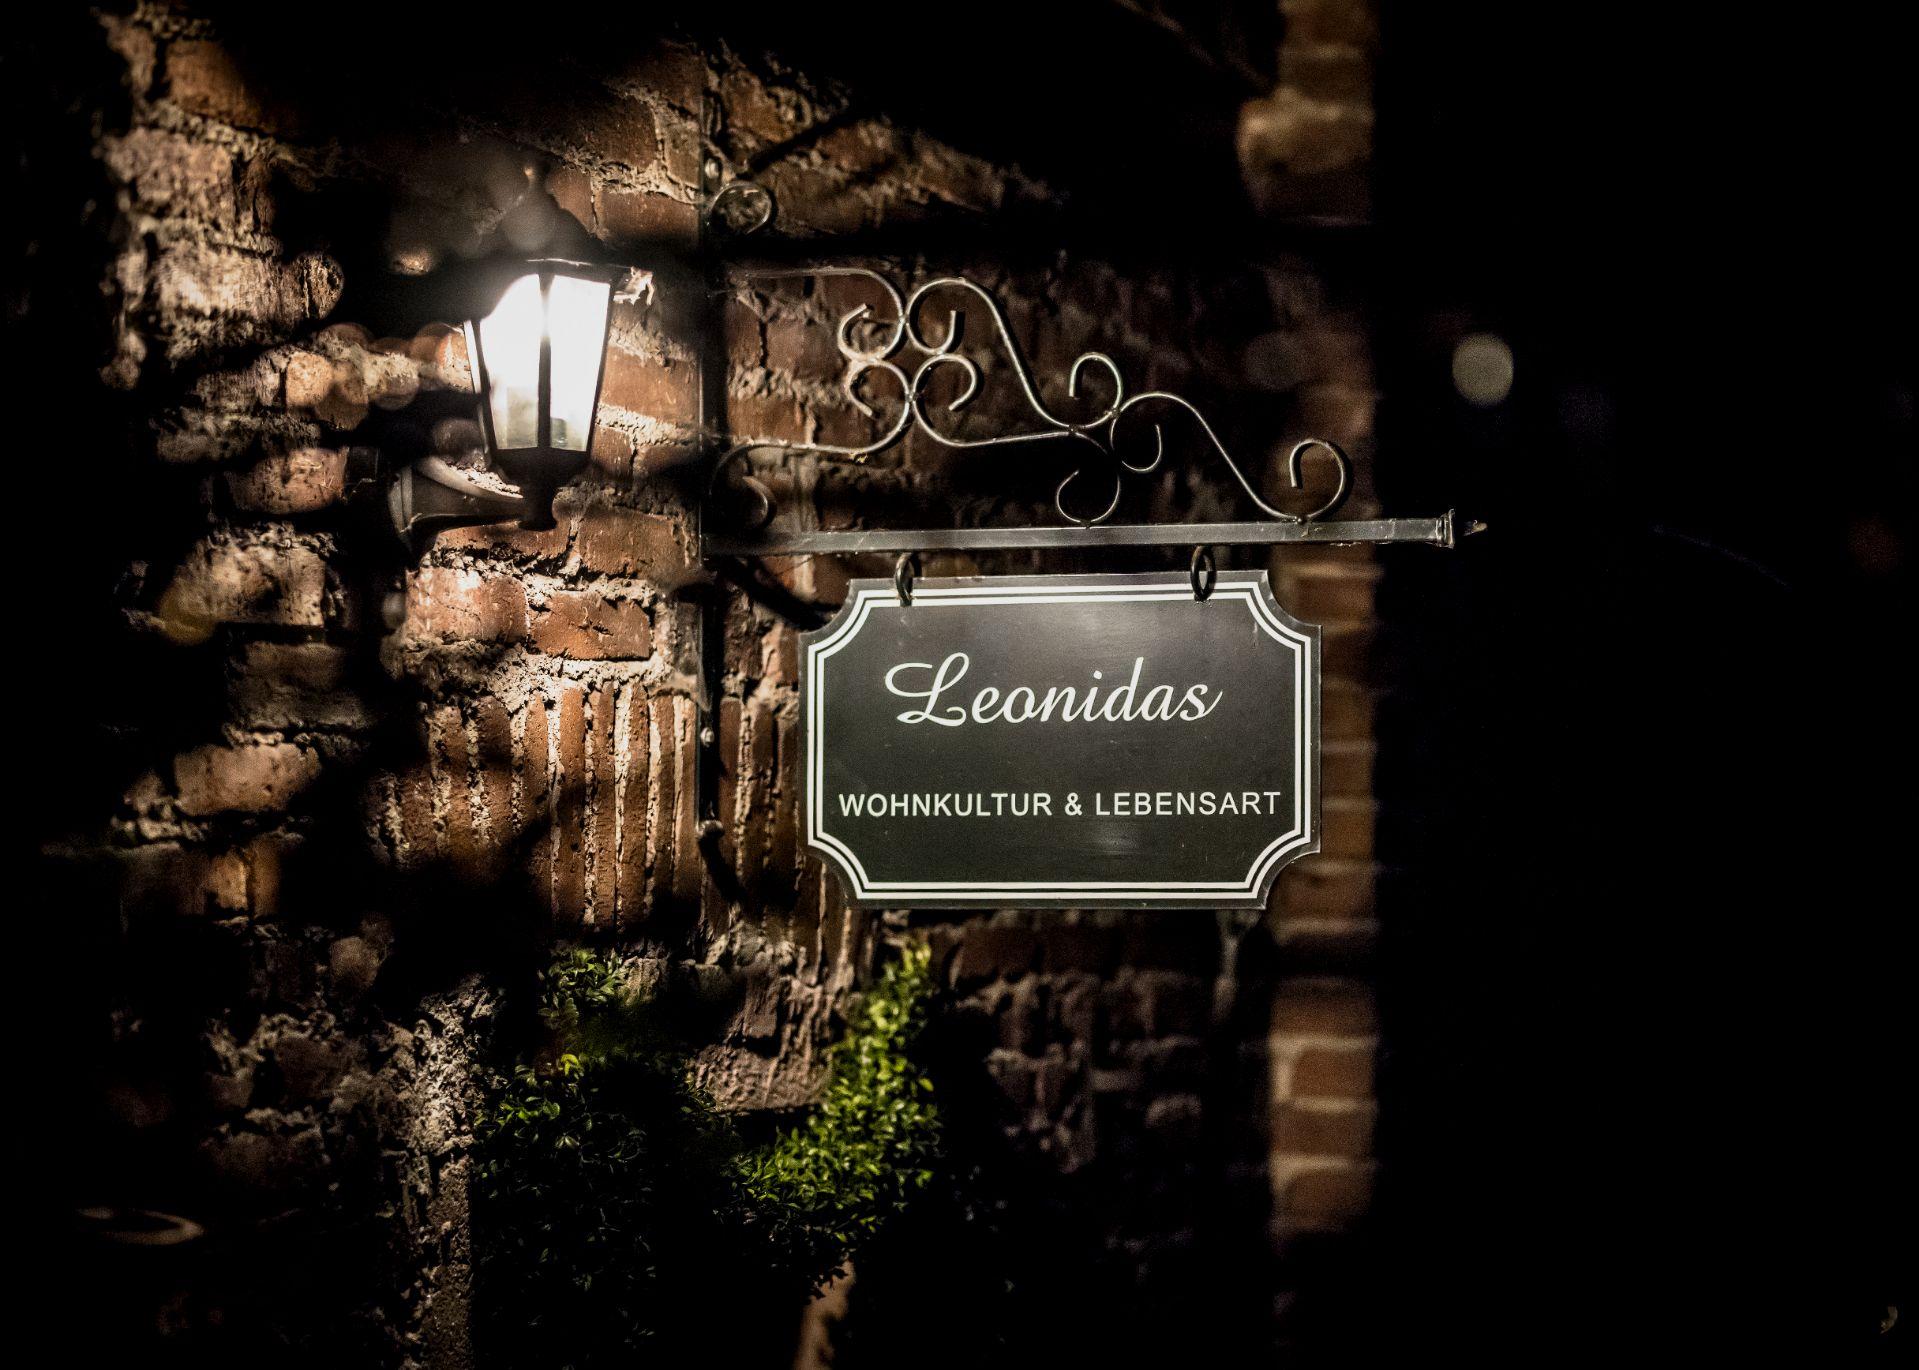 Leonidas Wohnkultur & Lebensart